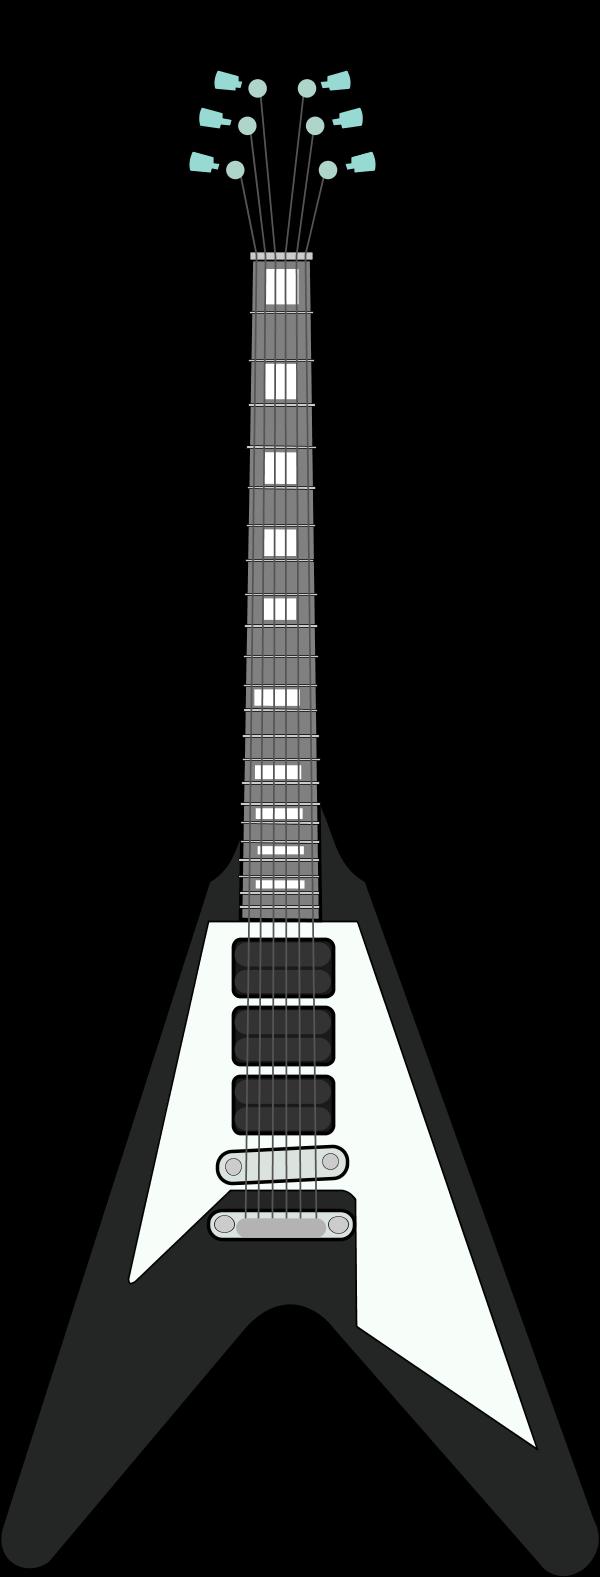 Rock panda free images. Outline clipart guitar